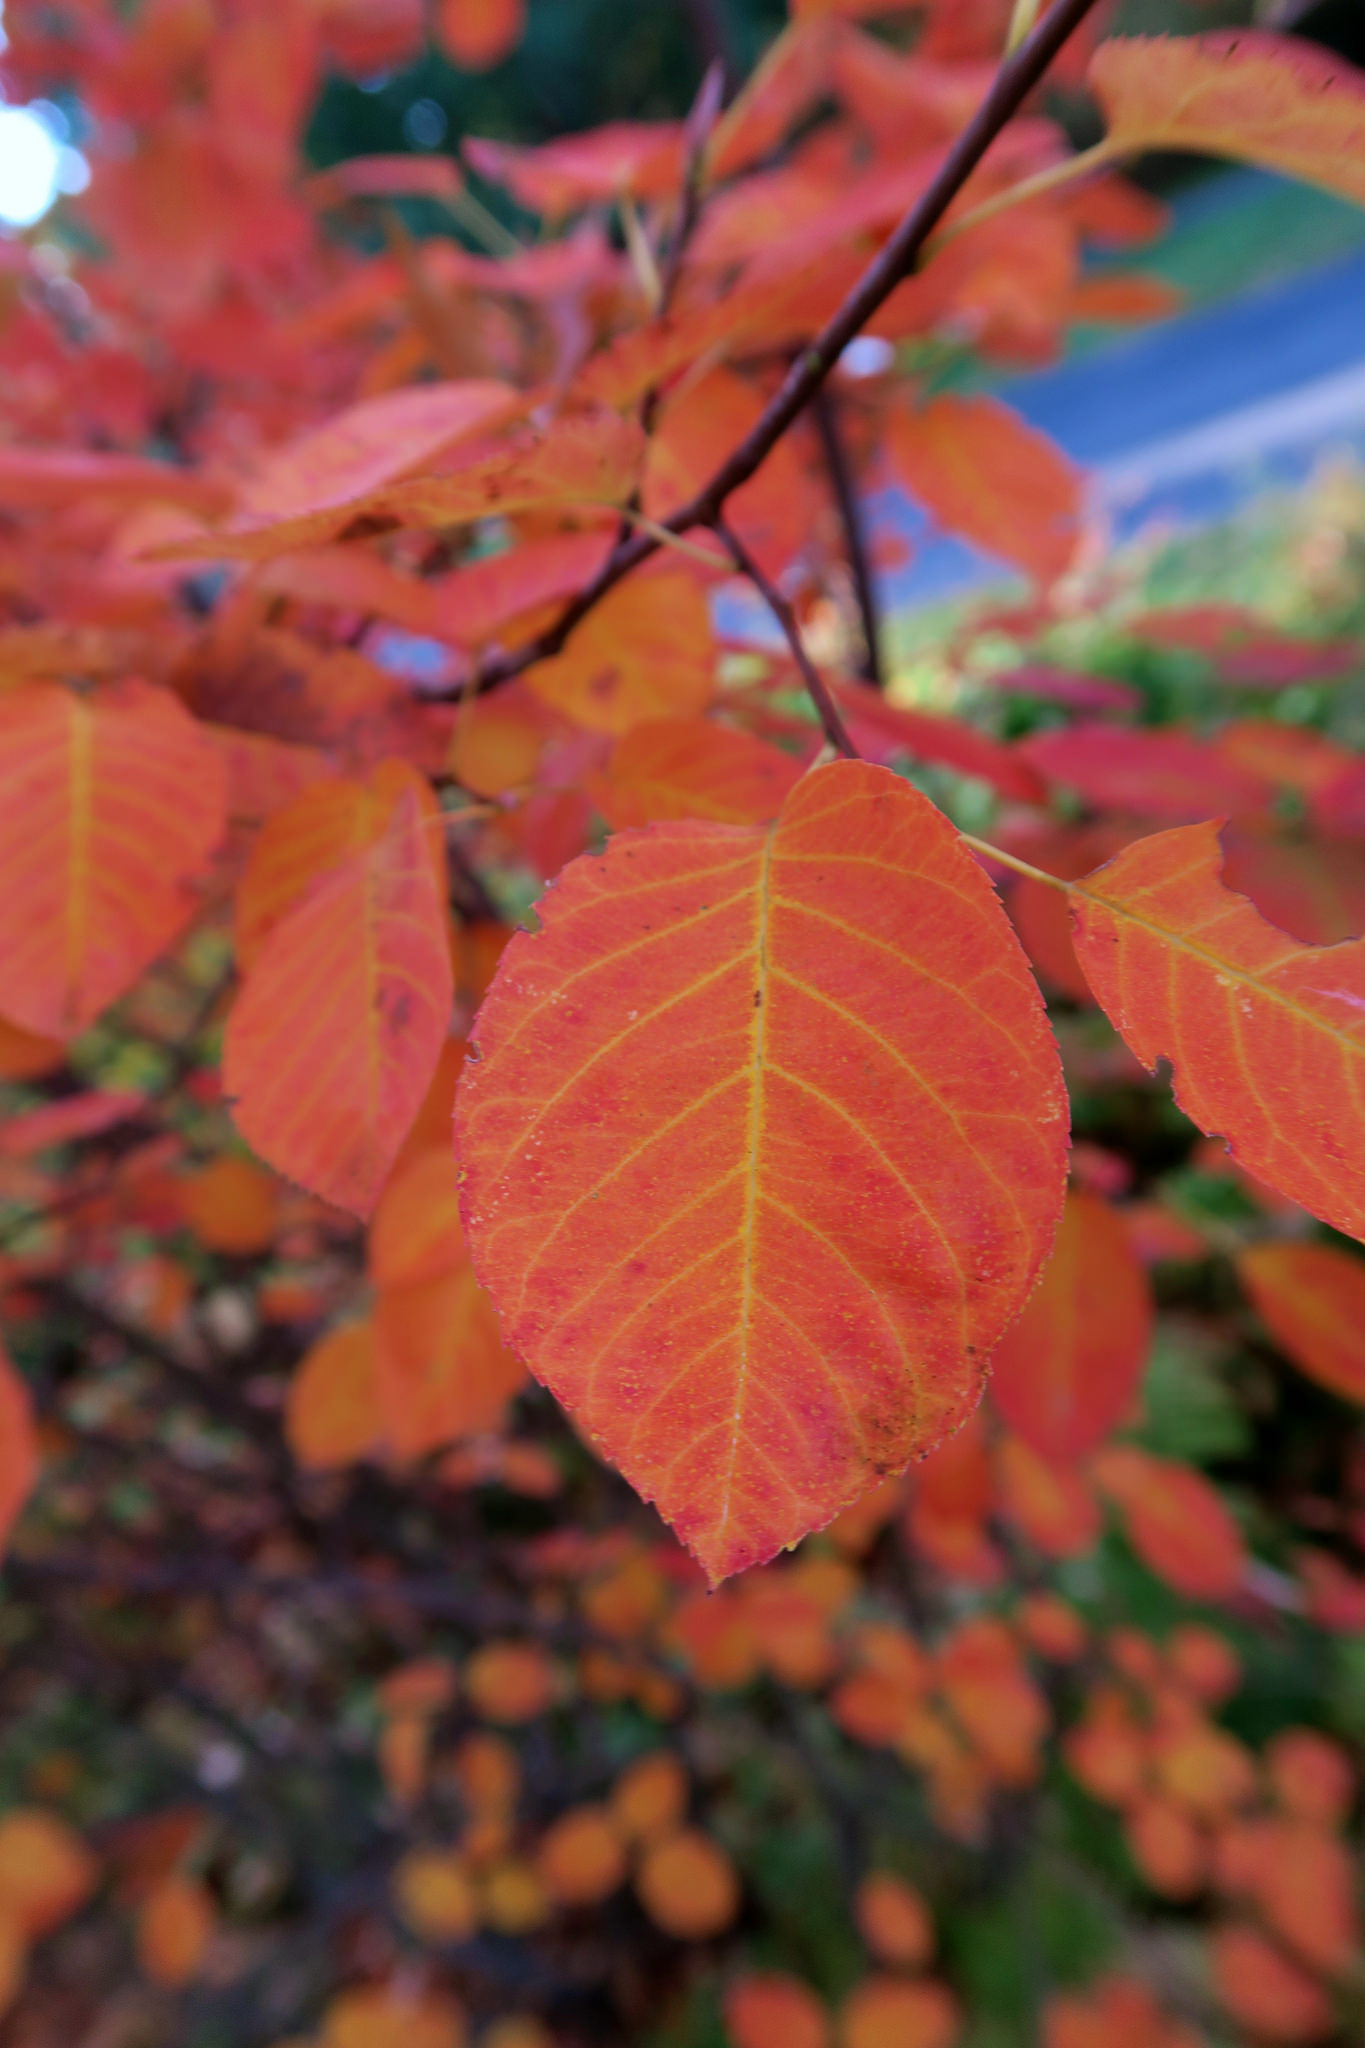 By Kristine Paulus, Aronia melanocarpa 'Autumn Magic', New York Botanic Garden, retrieved from Flikr, CC BY 2.0